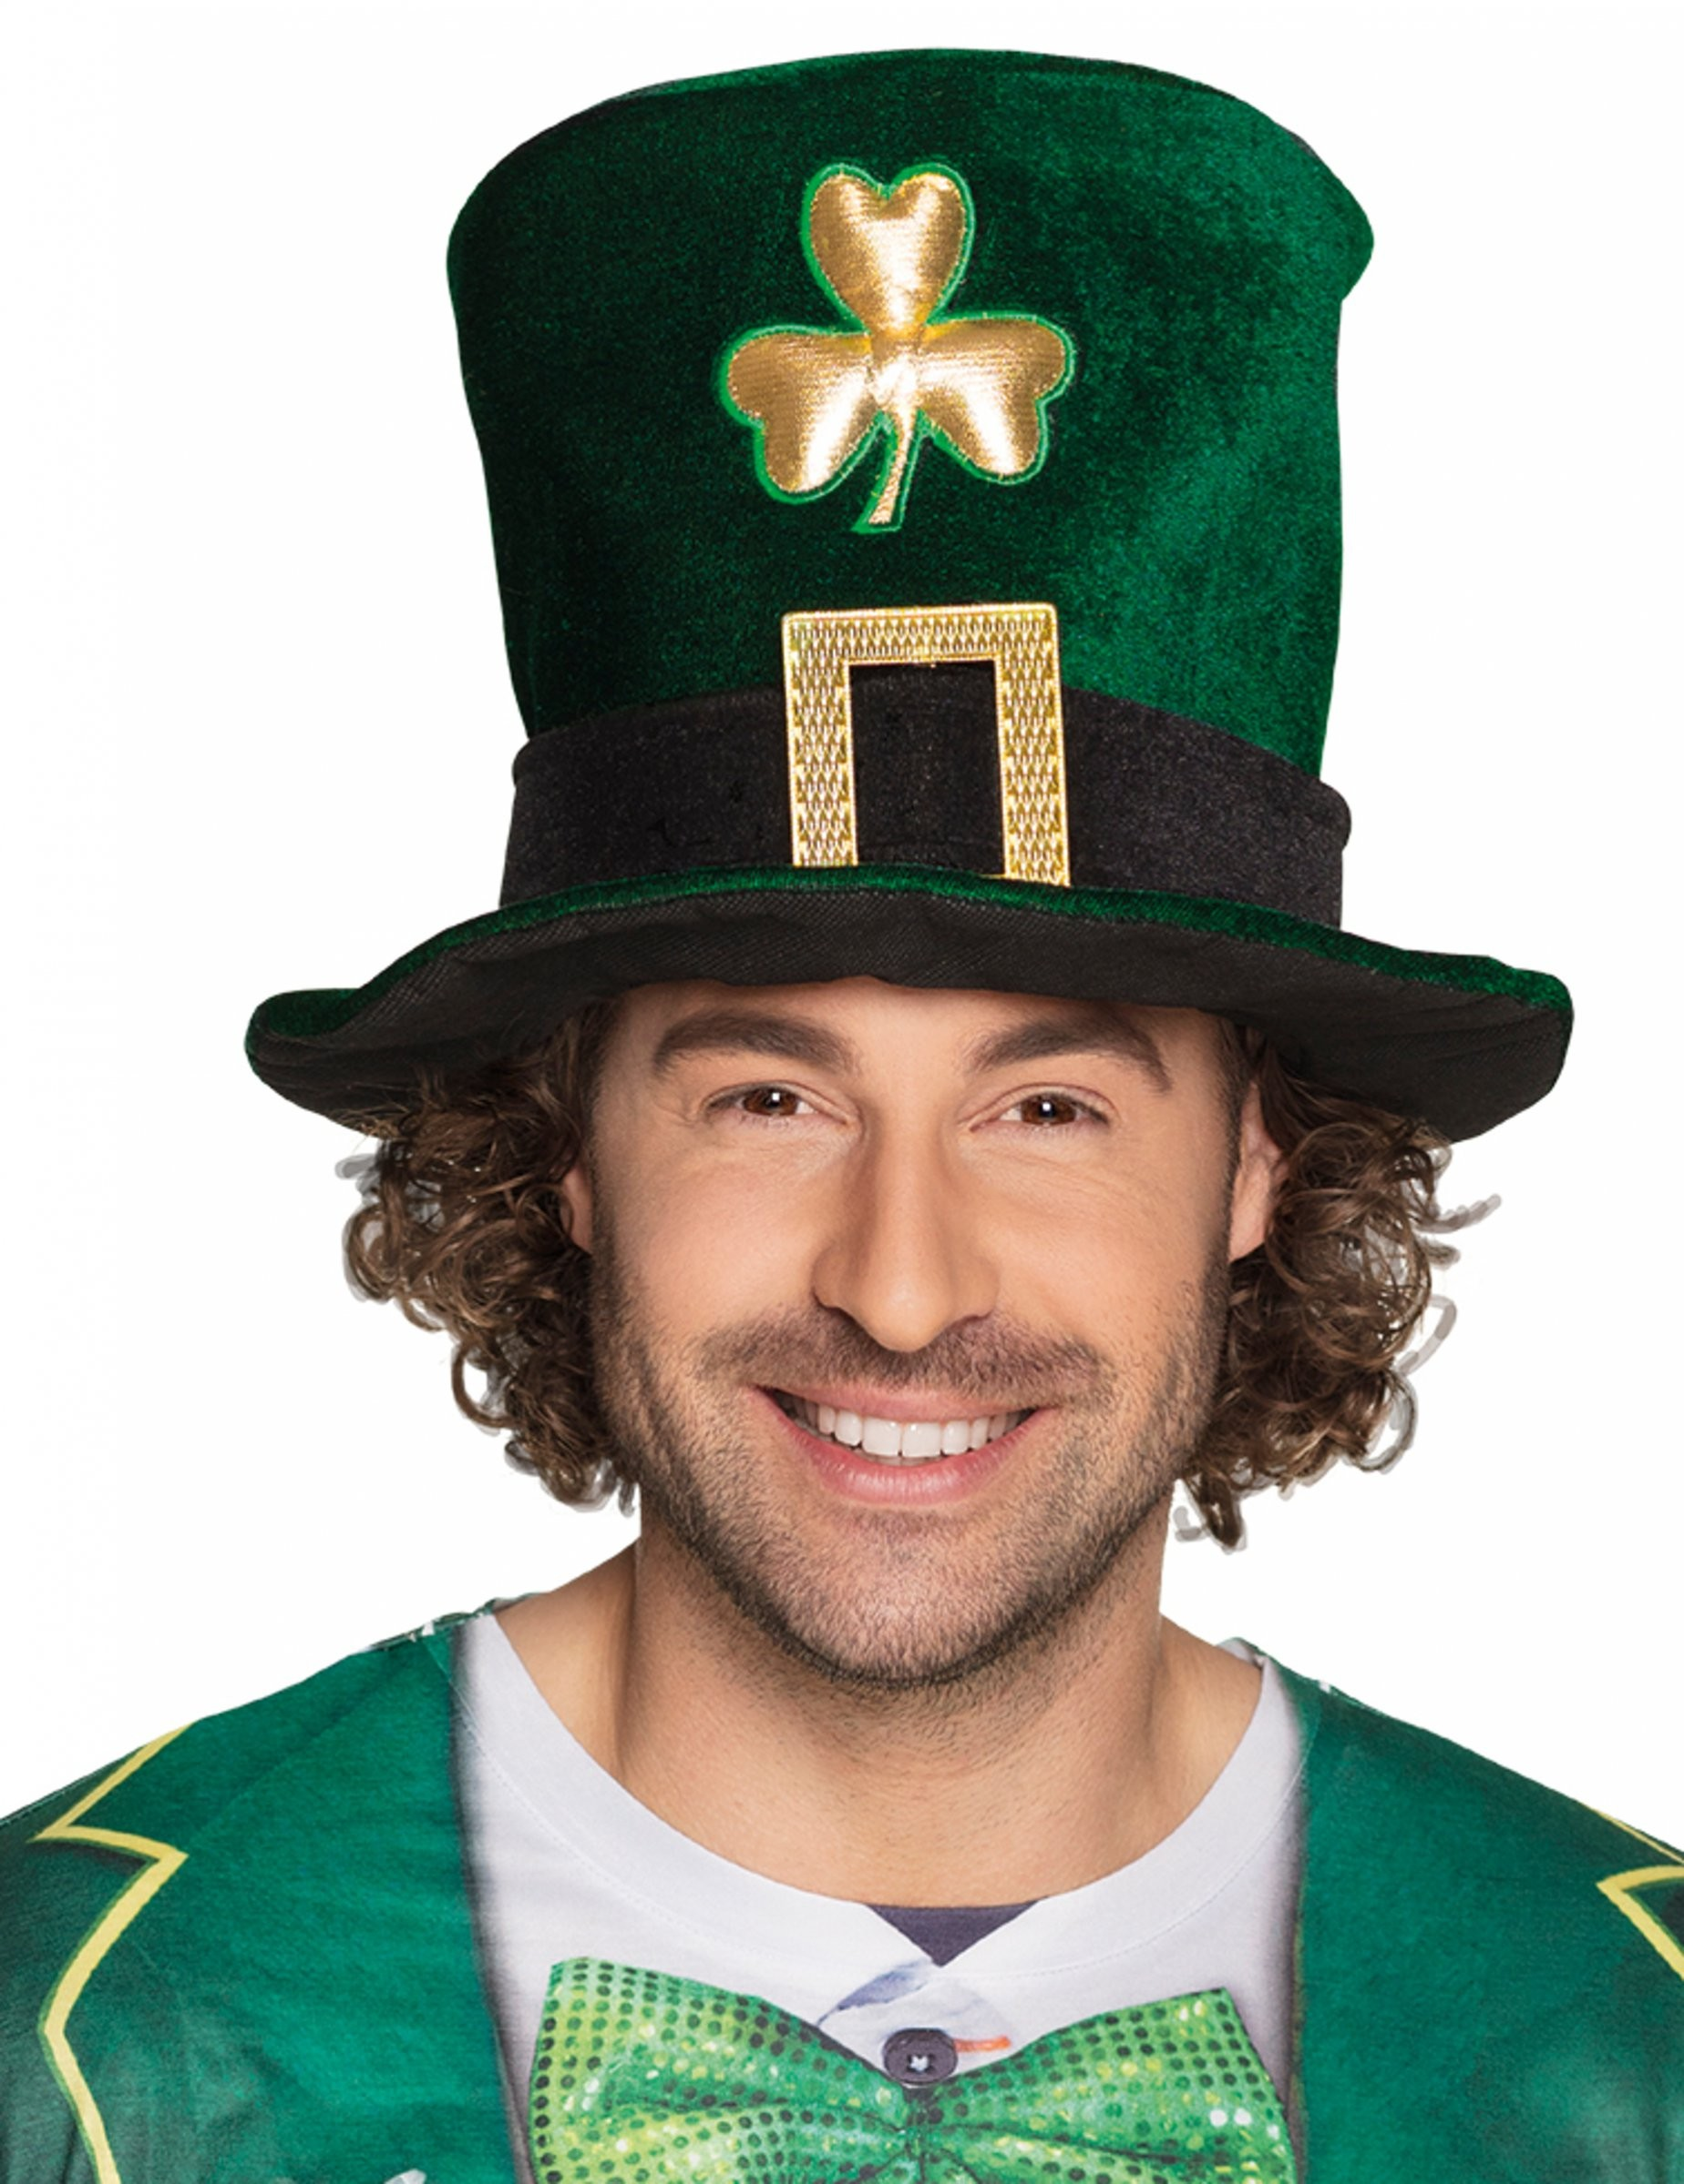 Idee de deguisement homme fashion designs - Idee de deguisement halloween ...